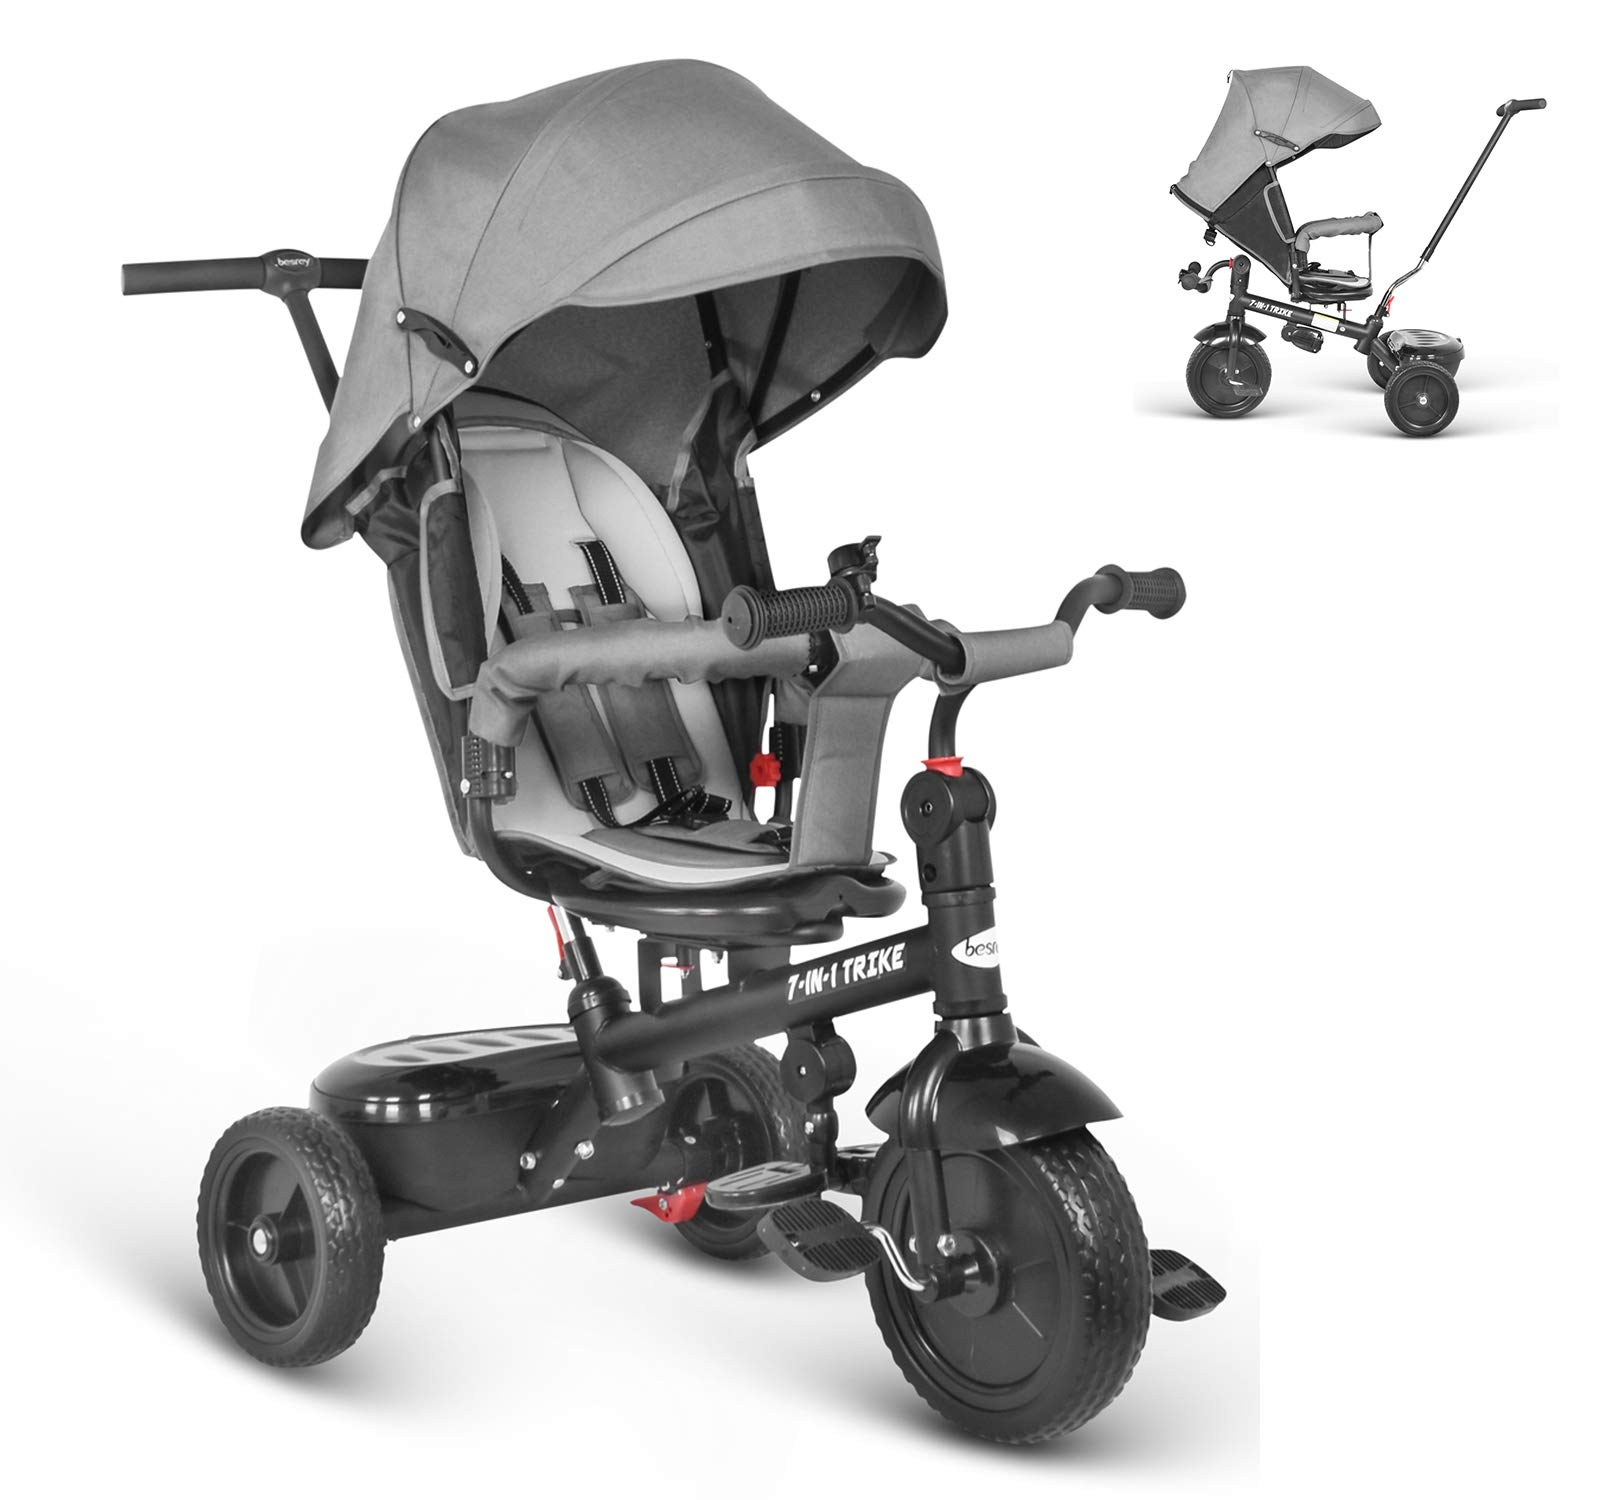 besrey 7 en 1 Triciclos Bebes reclinable con Asiento Giratorio, Triciclo para Bebe Nino evolutivo Infantil Trike…